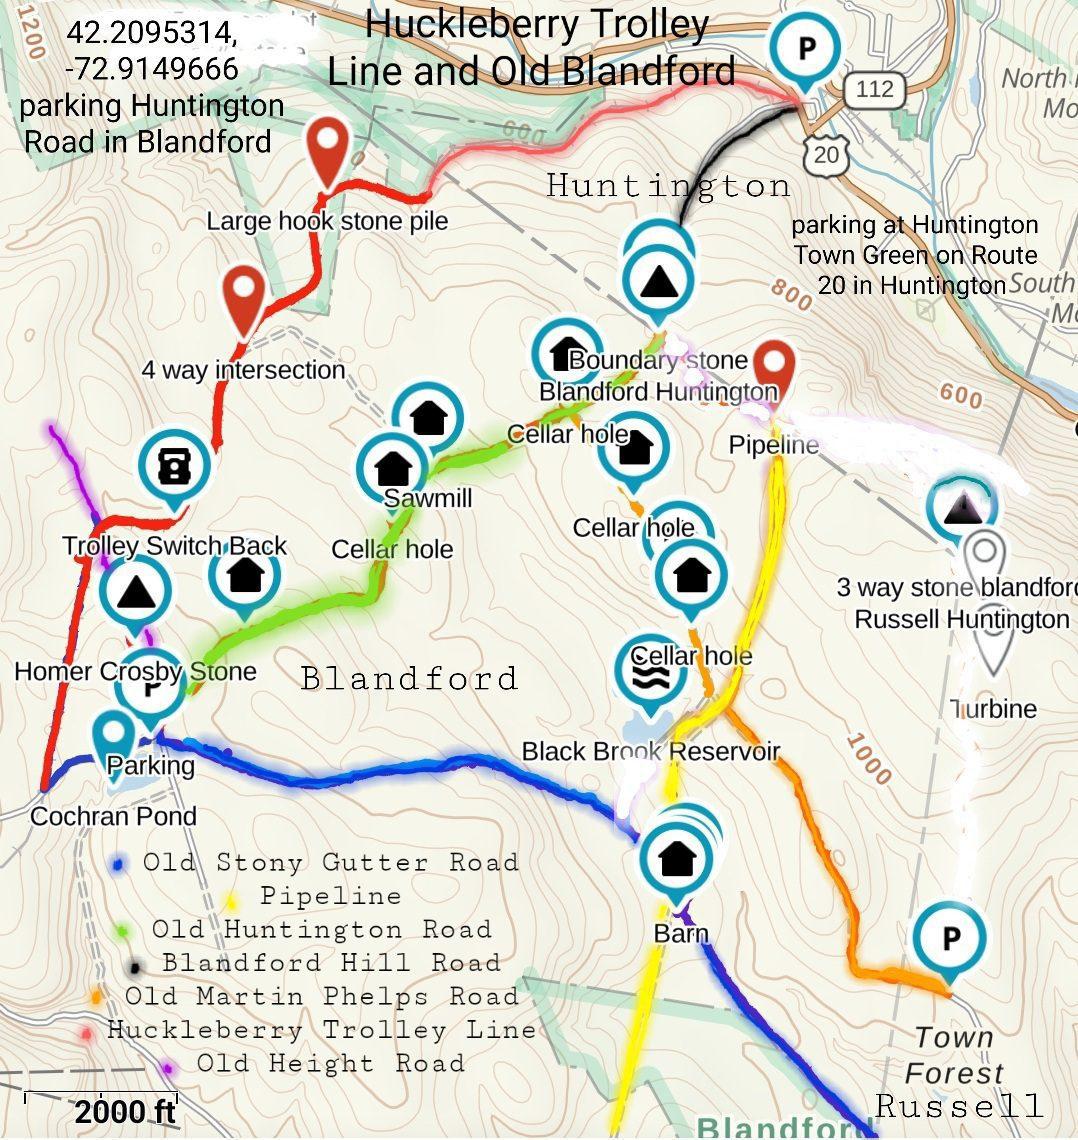 Blandford Huckleberry Trolley Line and Old Blandford